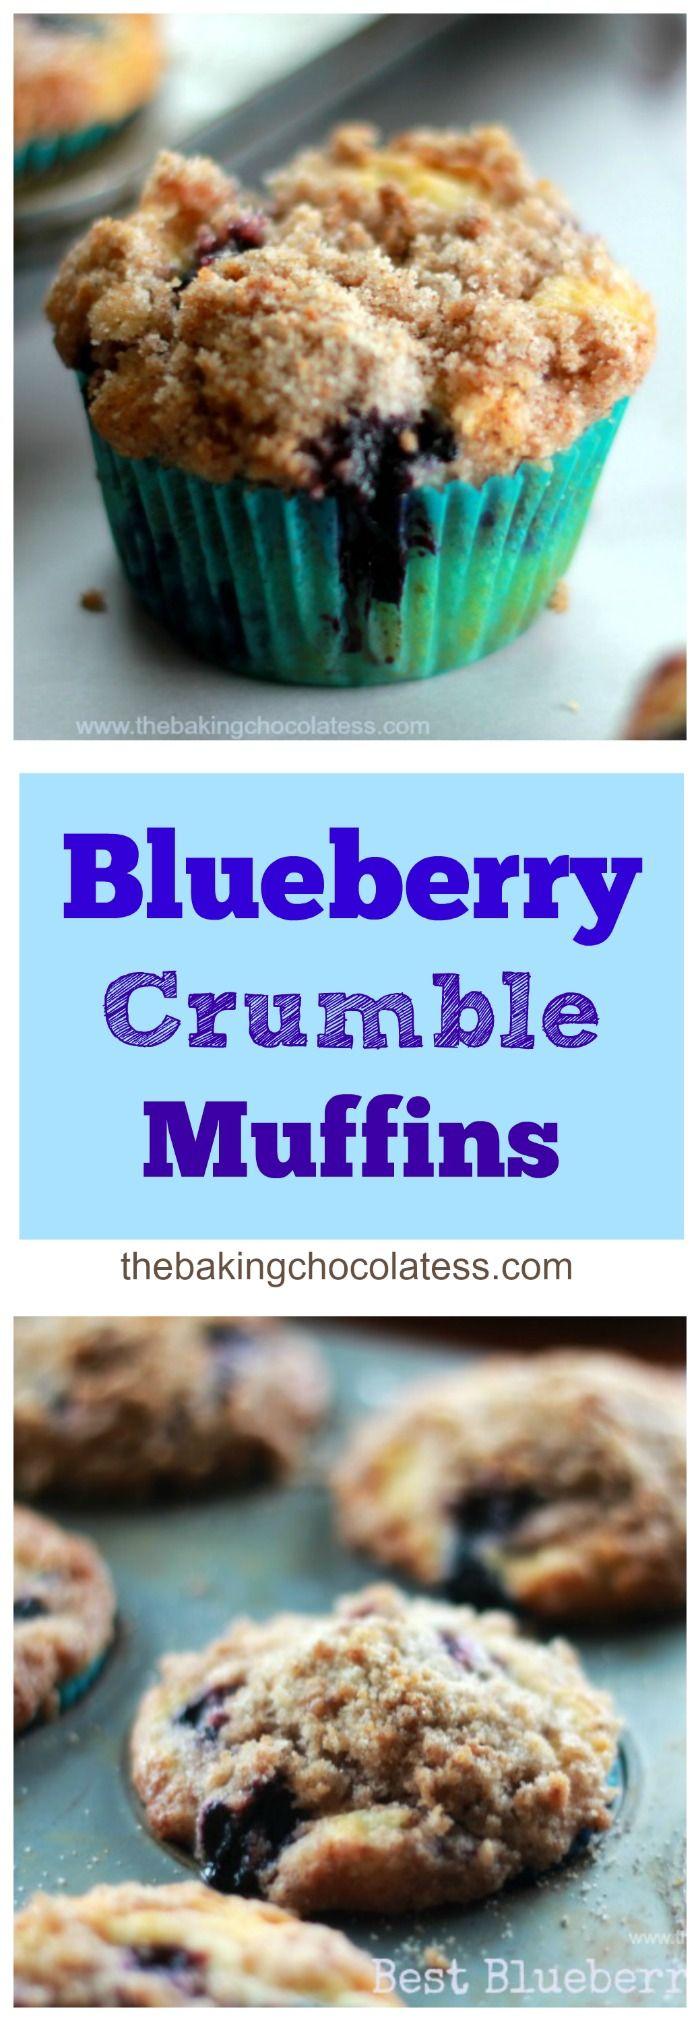 Best Blueberry Crumble Muffins via @https://www.pinterest.com/BaknChocolaTess/